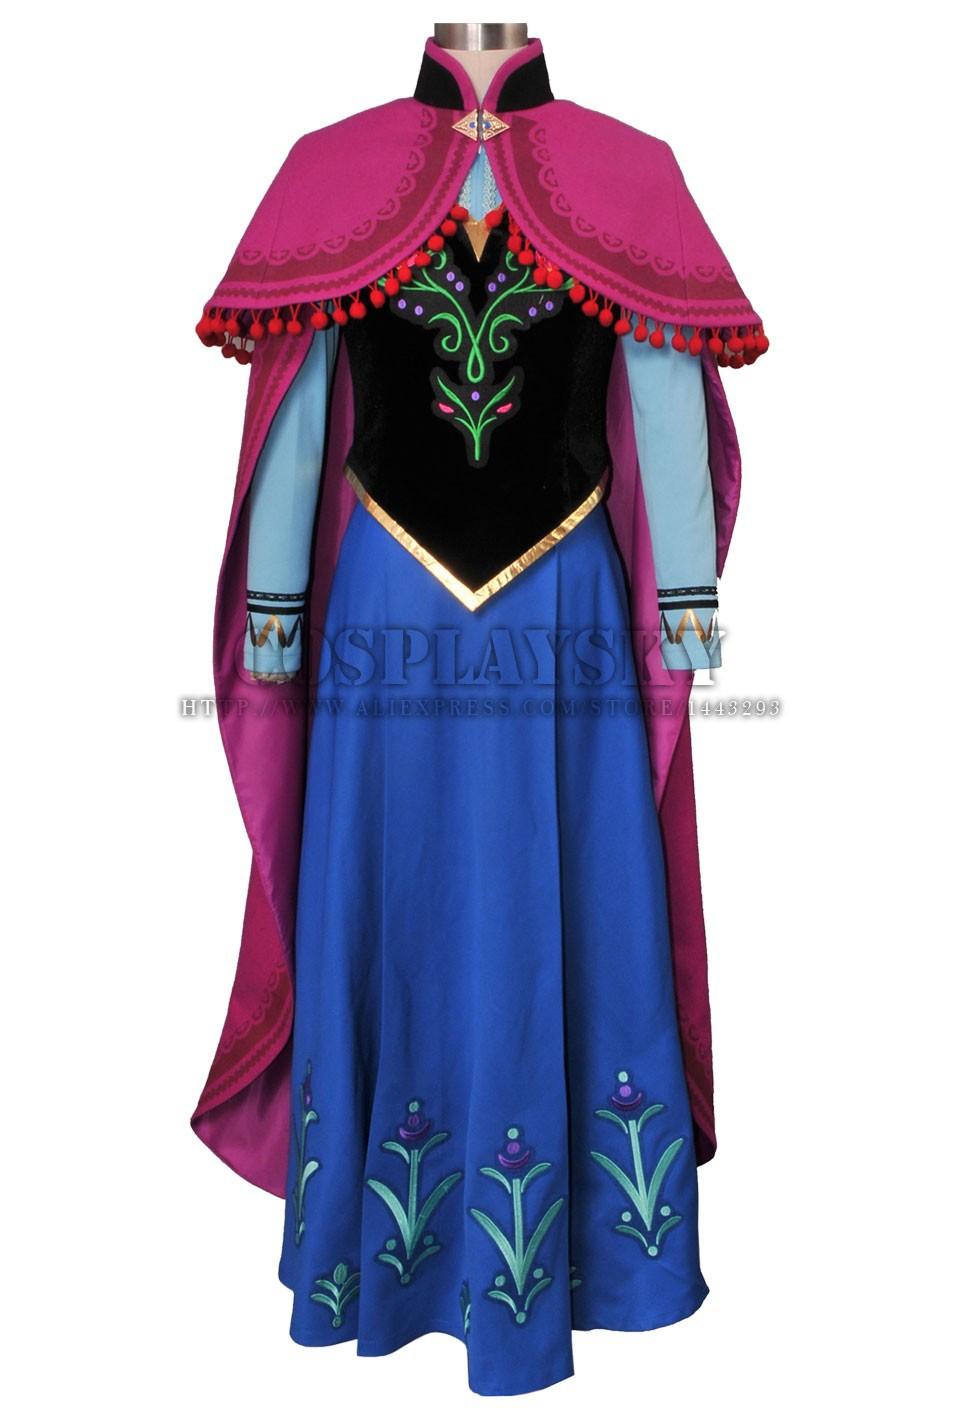 Frozen Anna Cosplay Costume Princess Anna Costume Set_01